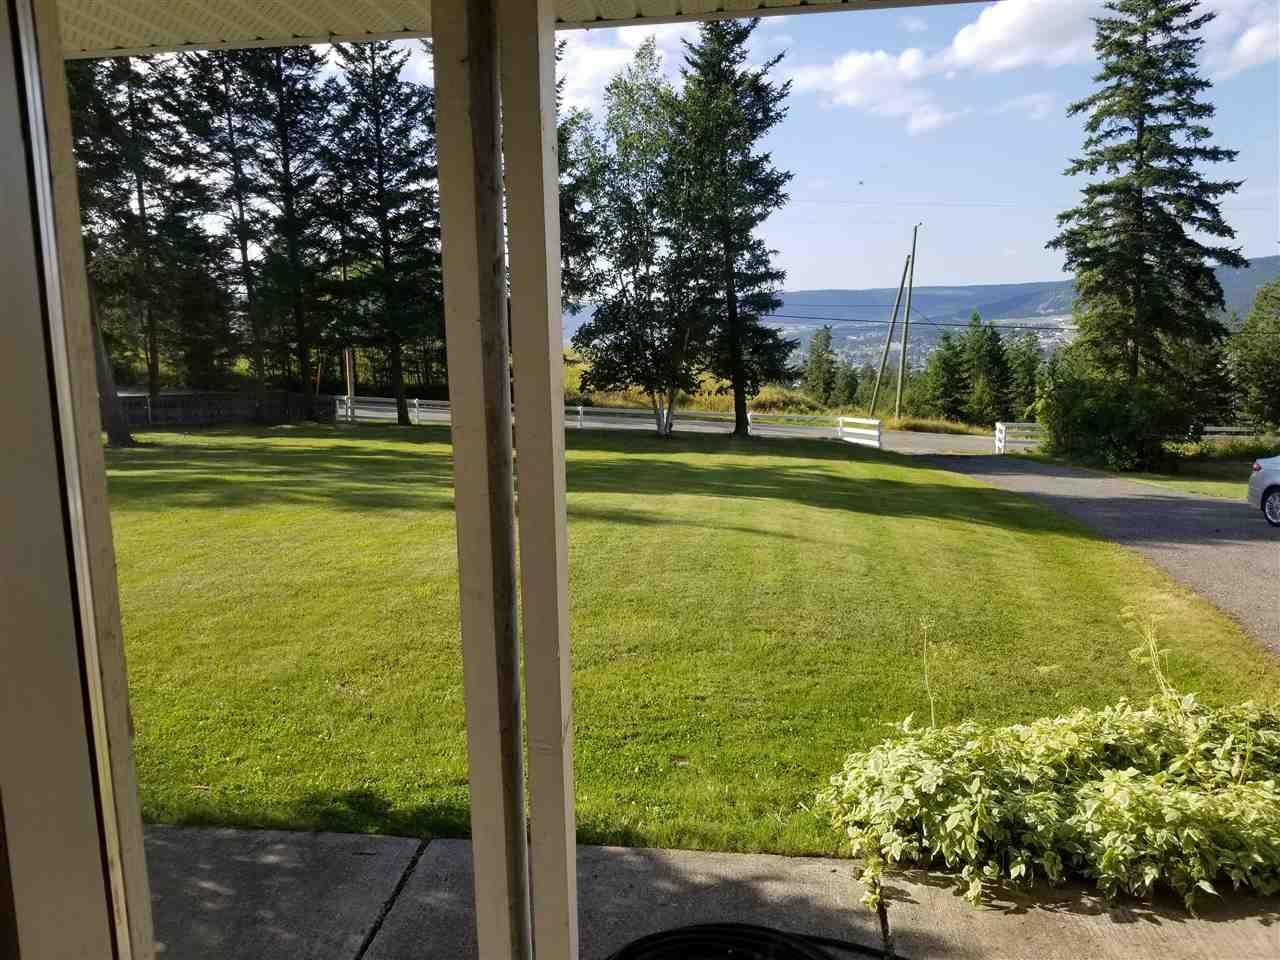 Photo 26: Photos: 511 TAMARACK Road in Williams Lake: Esler/Dog Creek House for sale (Williams Lake (Zone 27))  : MLS®# R2487403